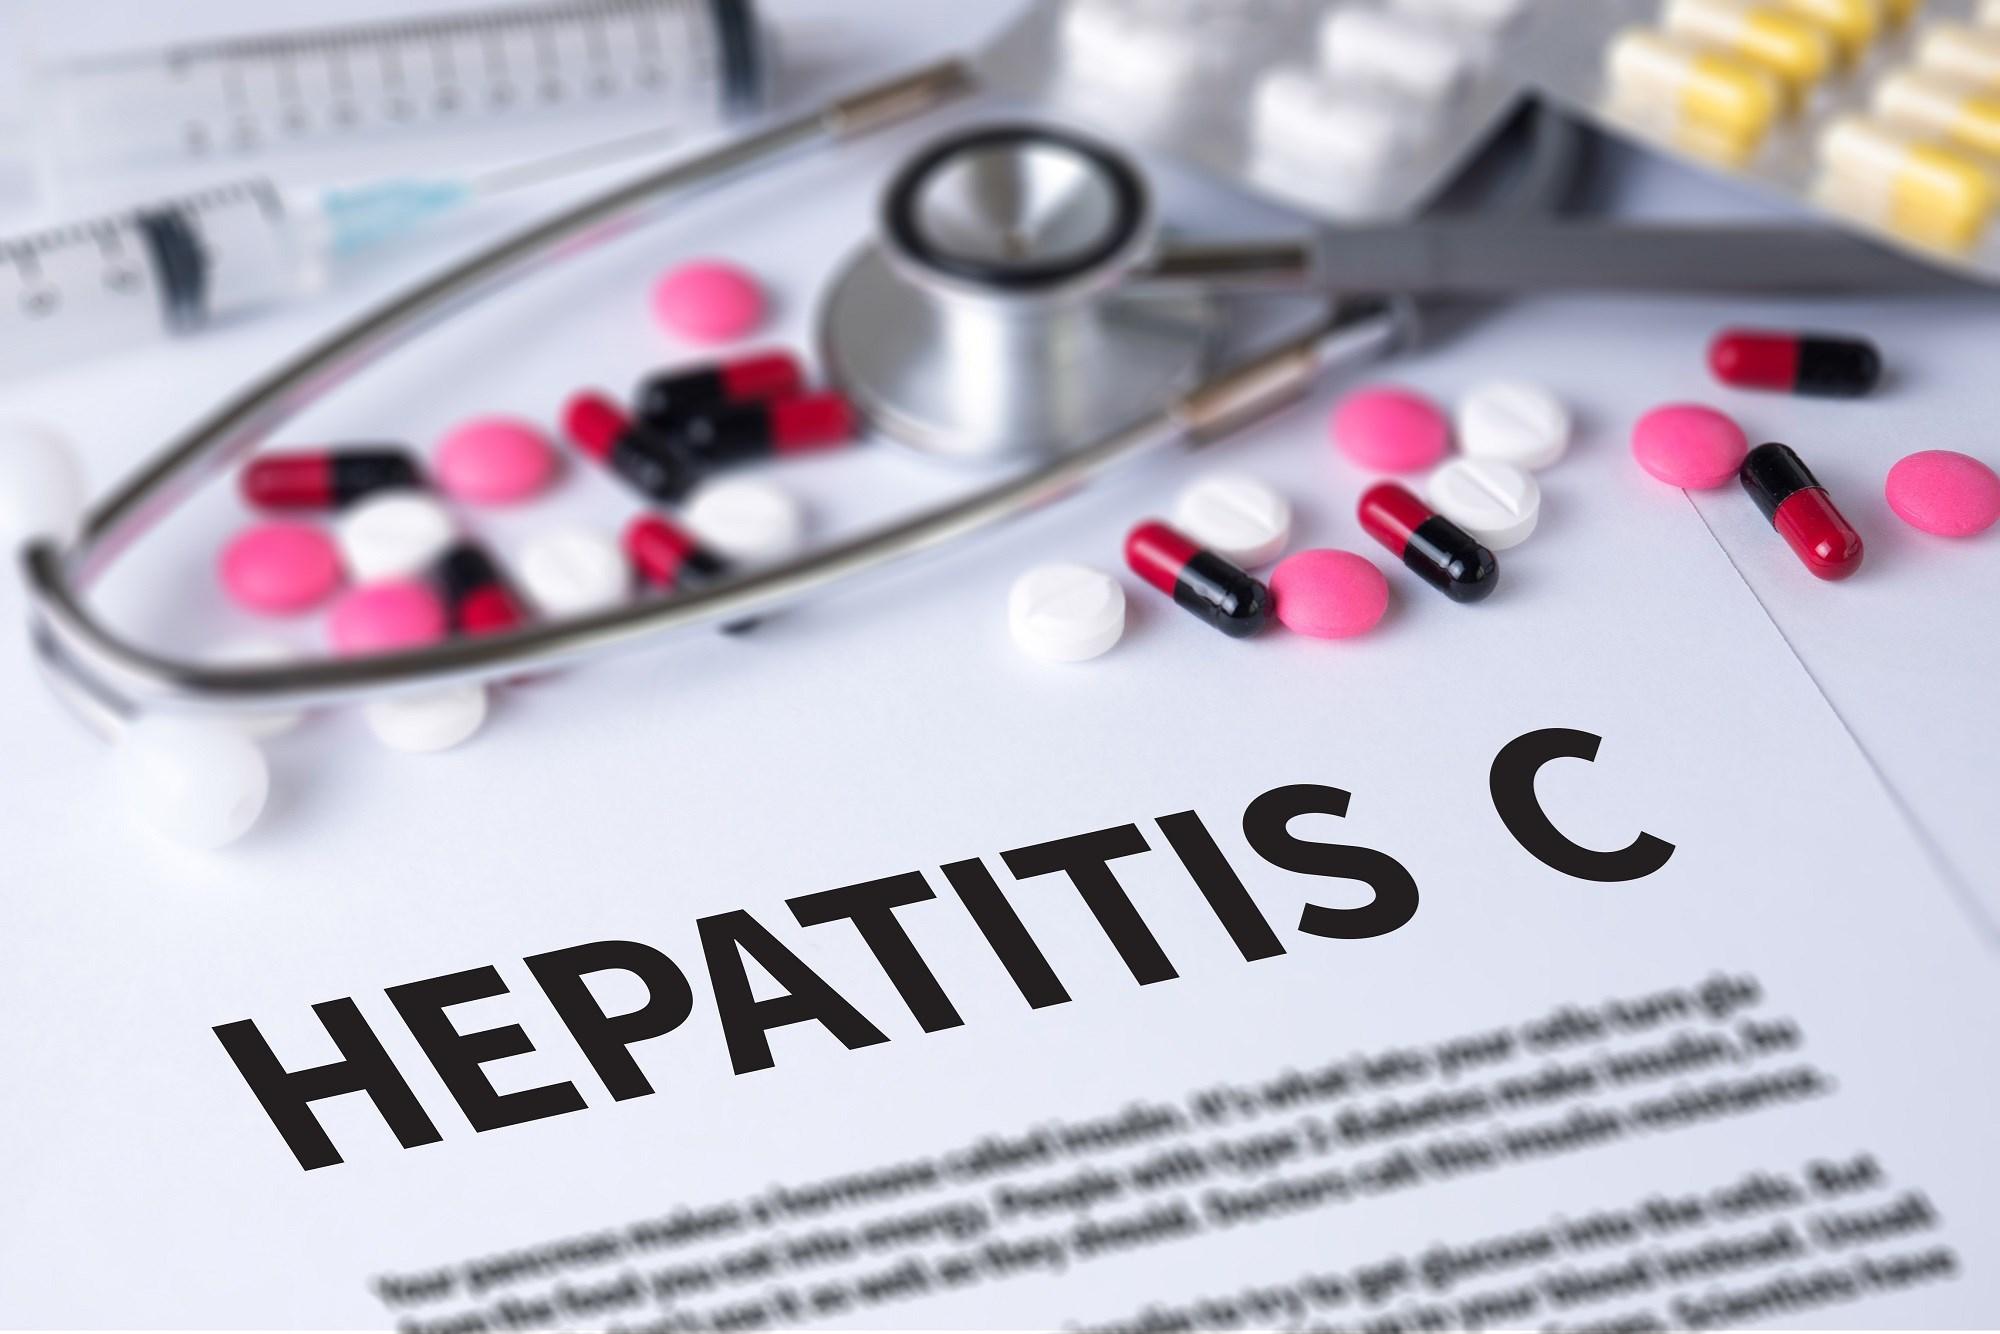 Safety and Efficacy of AL-335, Odalasvir, Simeprevir for HCV Genotype 1, 3